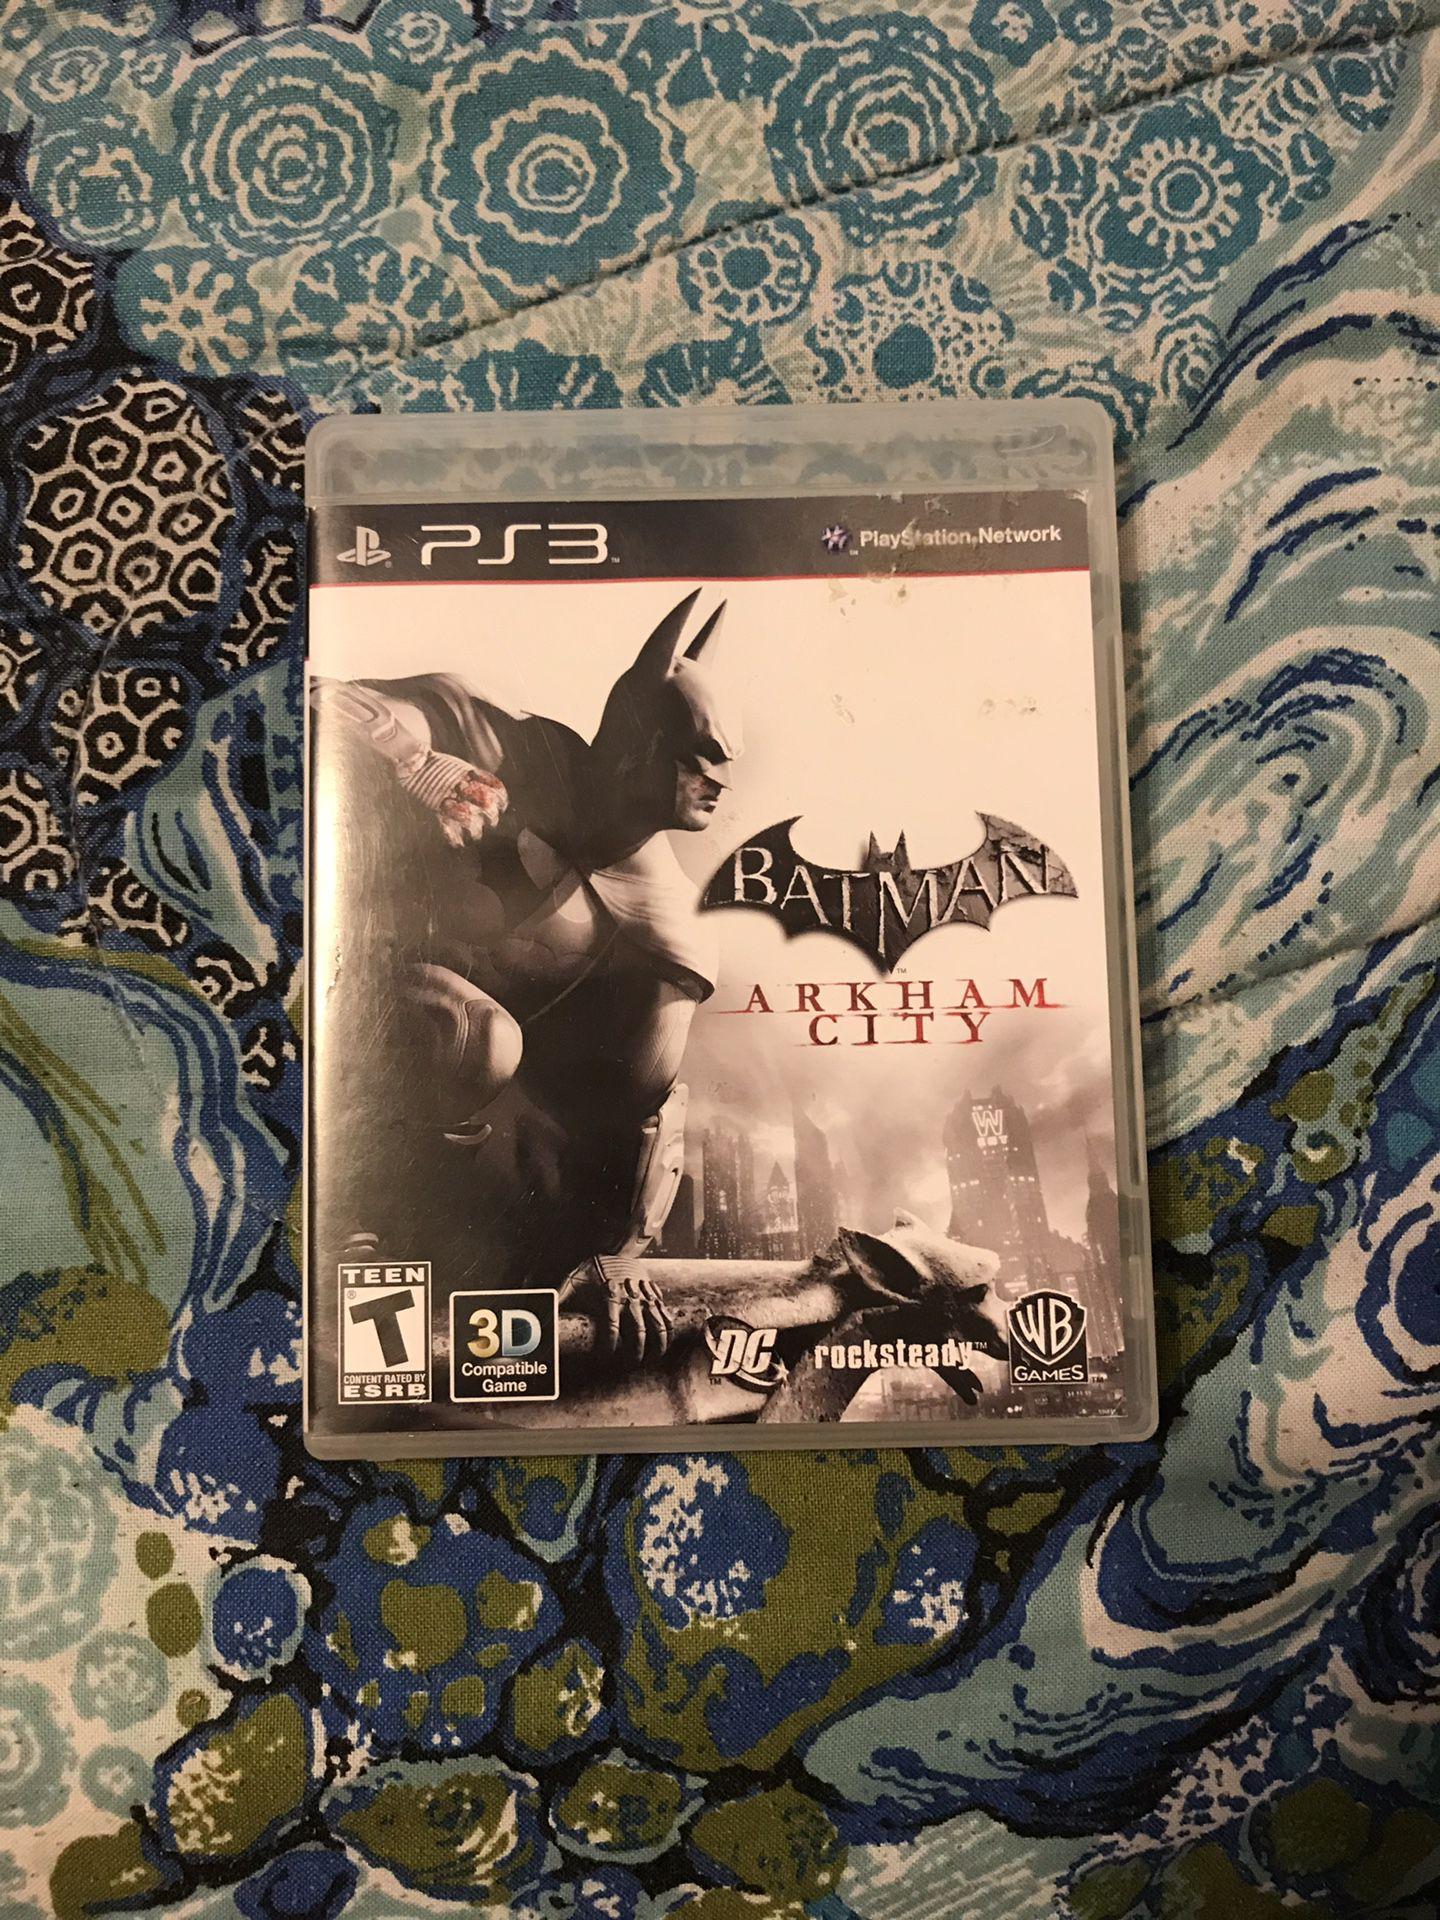 Batman Arkham city for ps3